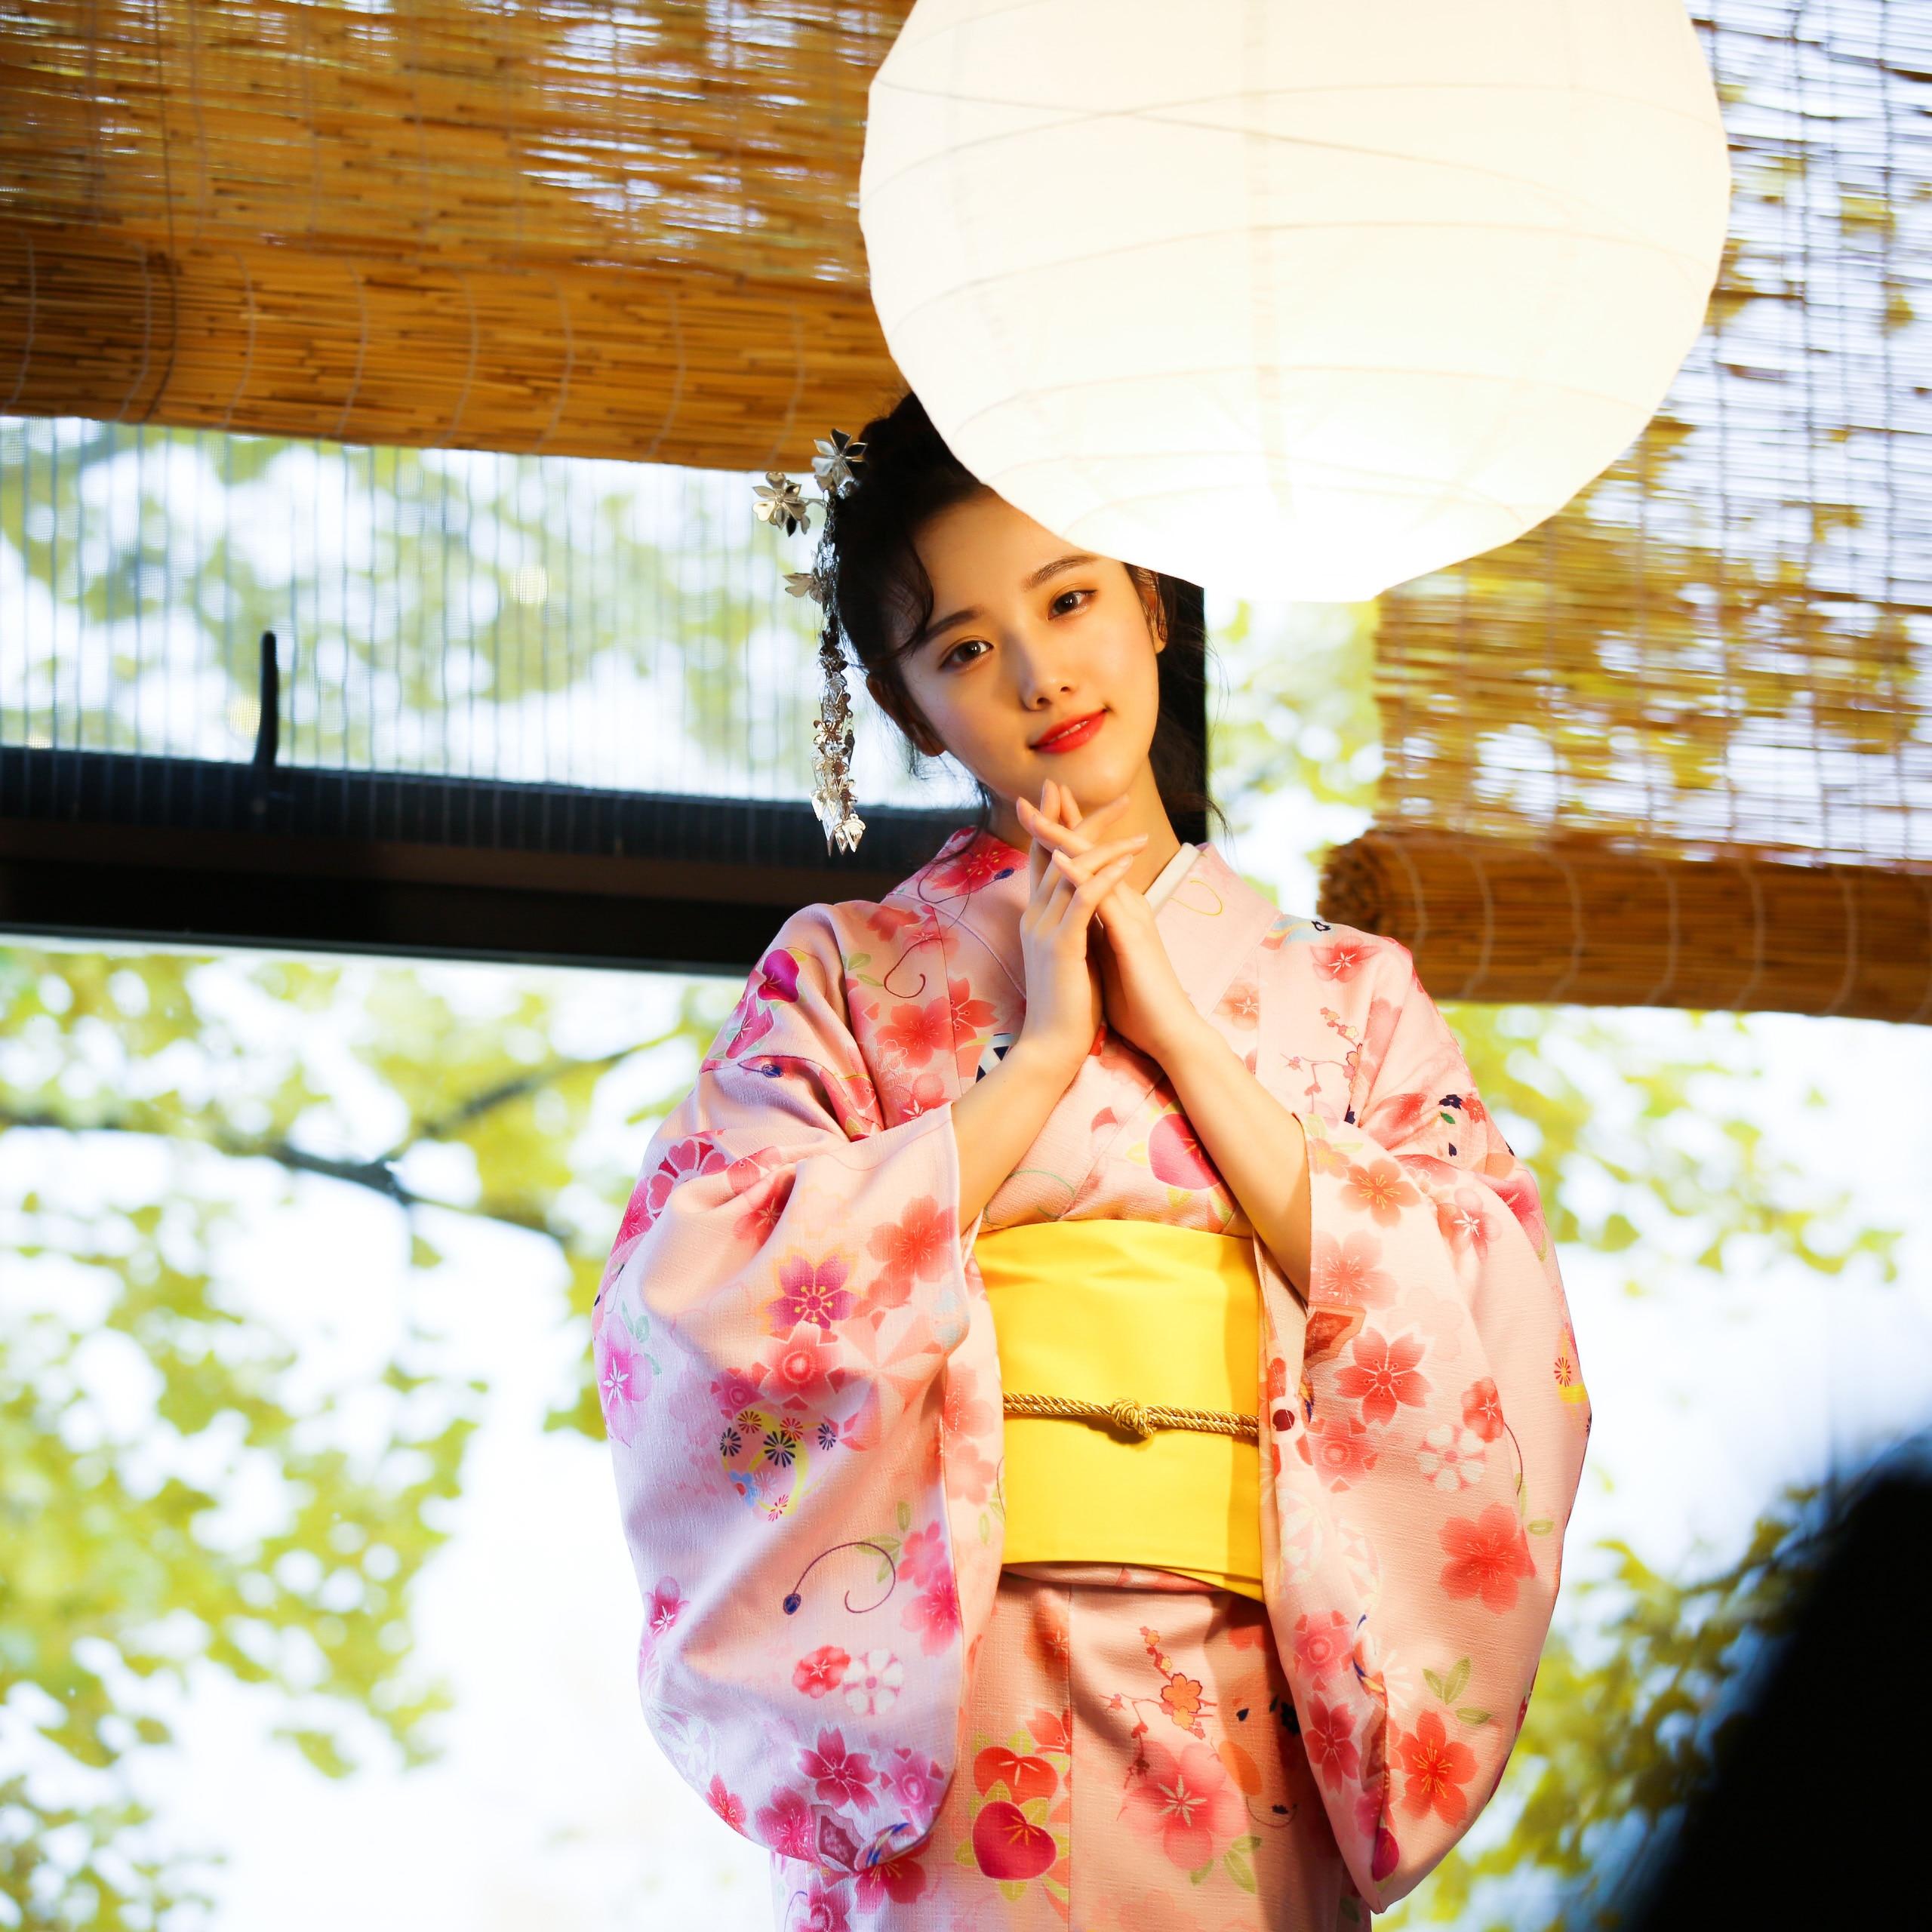 Pink Printed Japanese Girls Formal Dress Vintage Kimono Yukata Halloween Party Women Cosplay Costume Elegant Robe With Obi